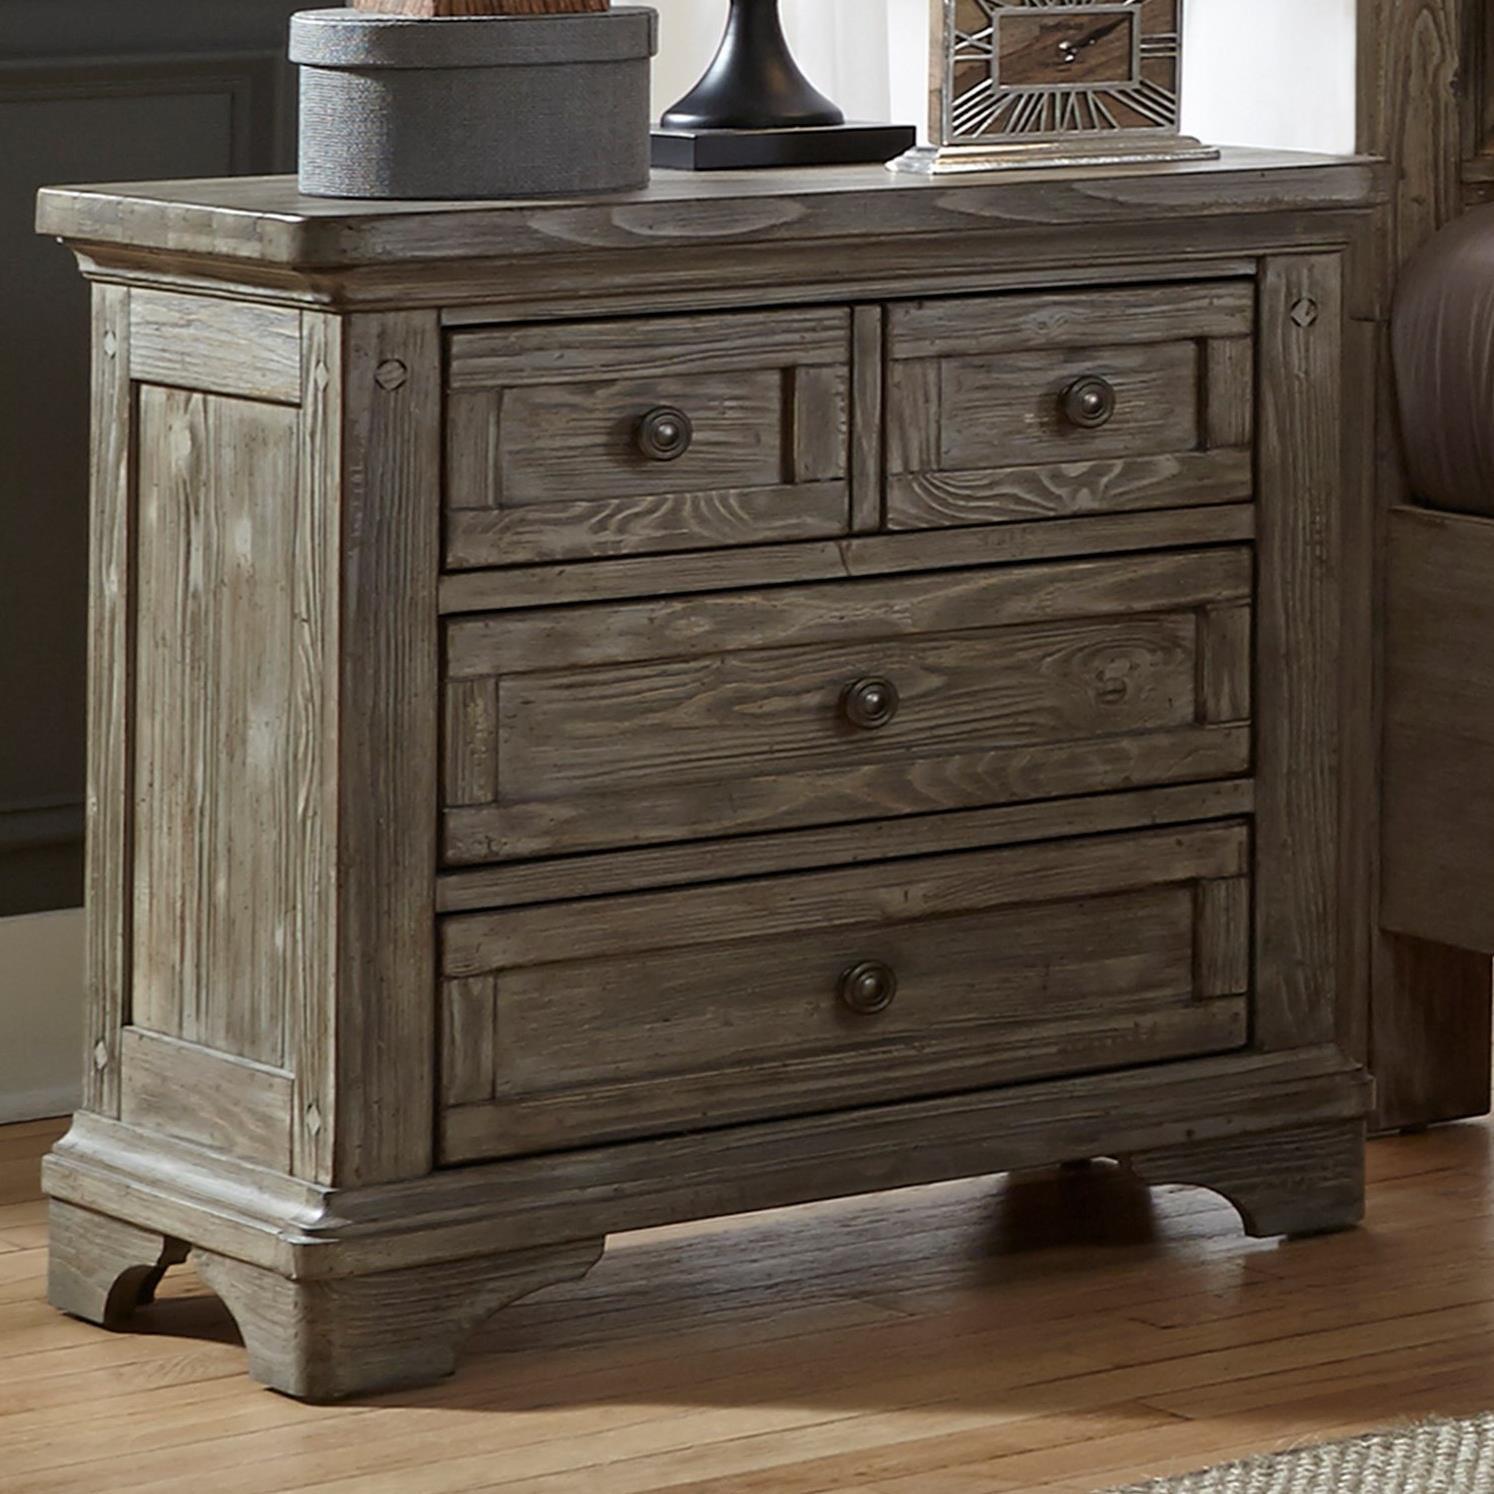 Liberty Furniture Highlands Nightstand   Item Number: 727 BR61